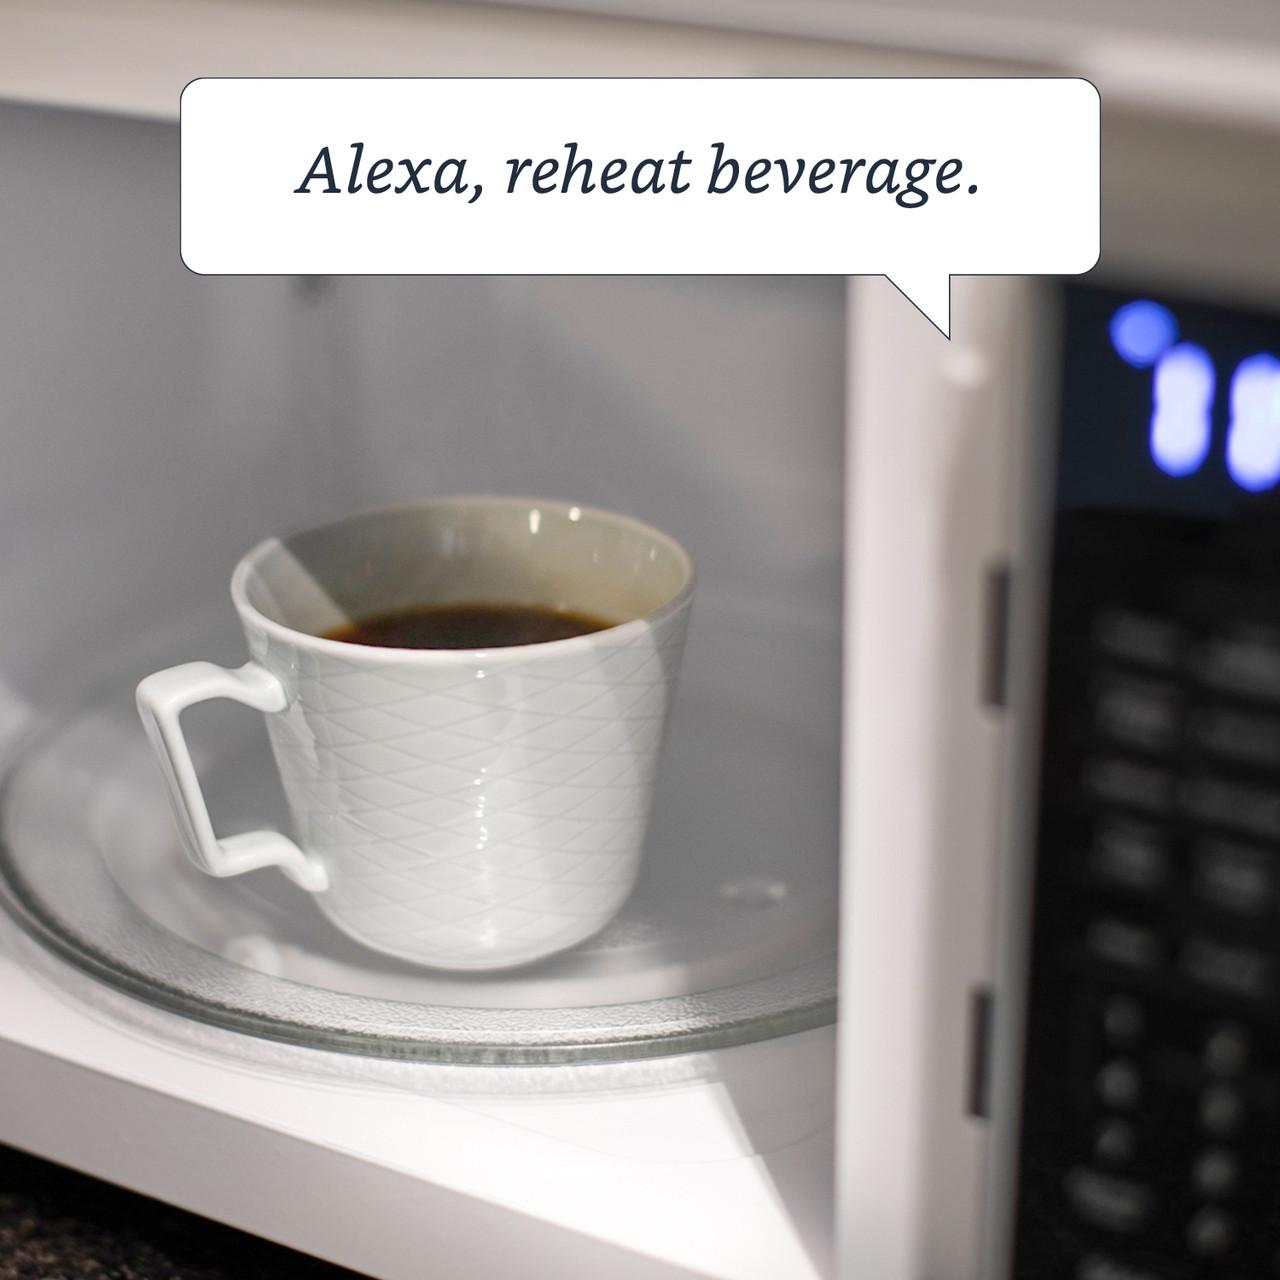 1.1 cu. ft. Sharp Stainless Steel Smart Microwave (SMC1139FS) –Alexa Reheat Beverage Command